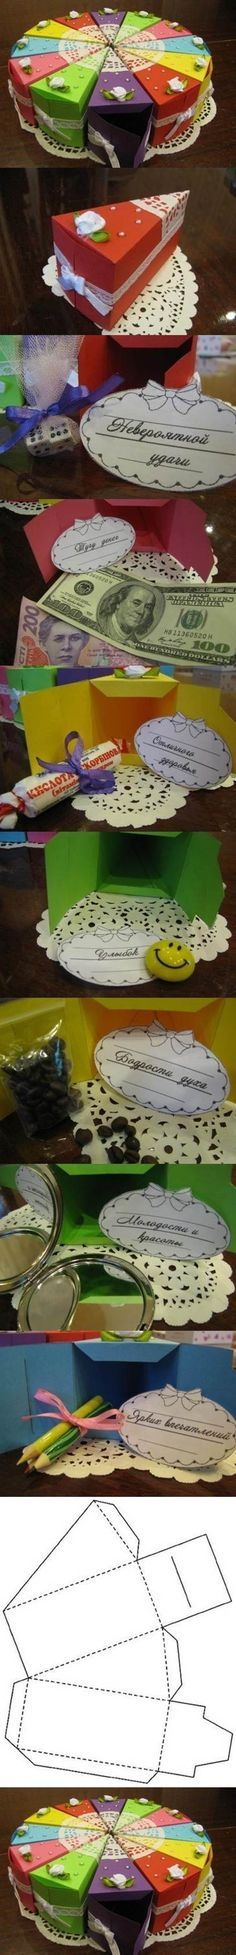 DIY Cake Shaped Gift Boxes | iCreativeIdeas.com Like Us on Facebook ==> https://www.facebook.com/icreativeideas